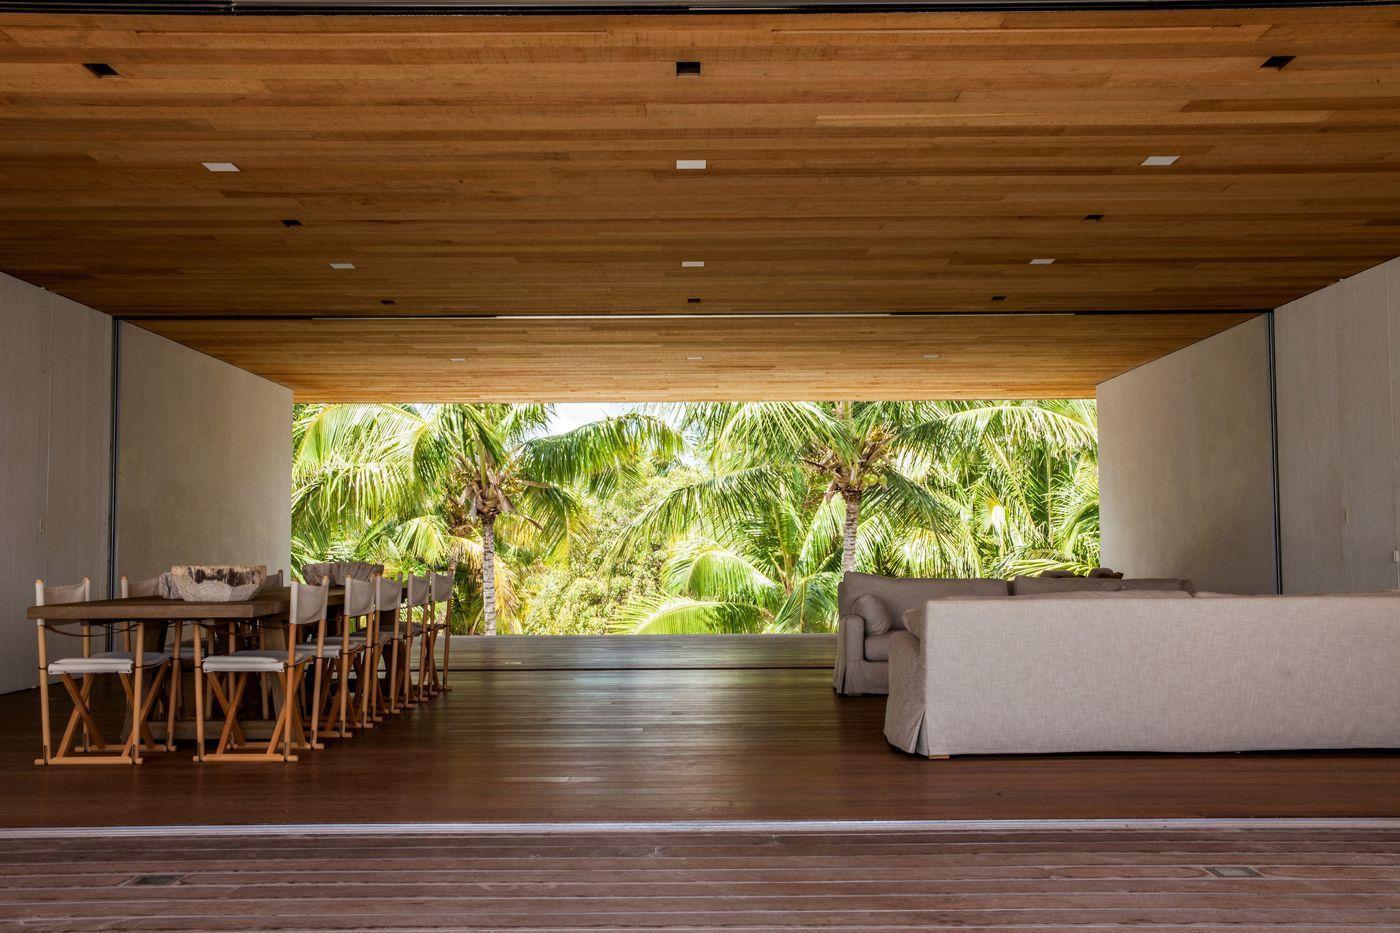 house-on-a-dune-in-the-bahamas-4.jpg